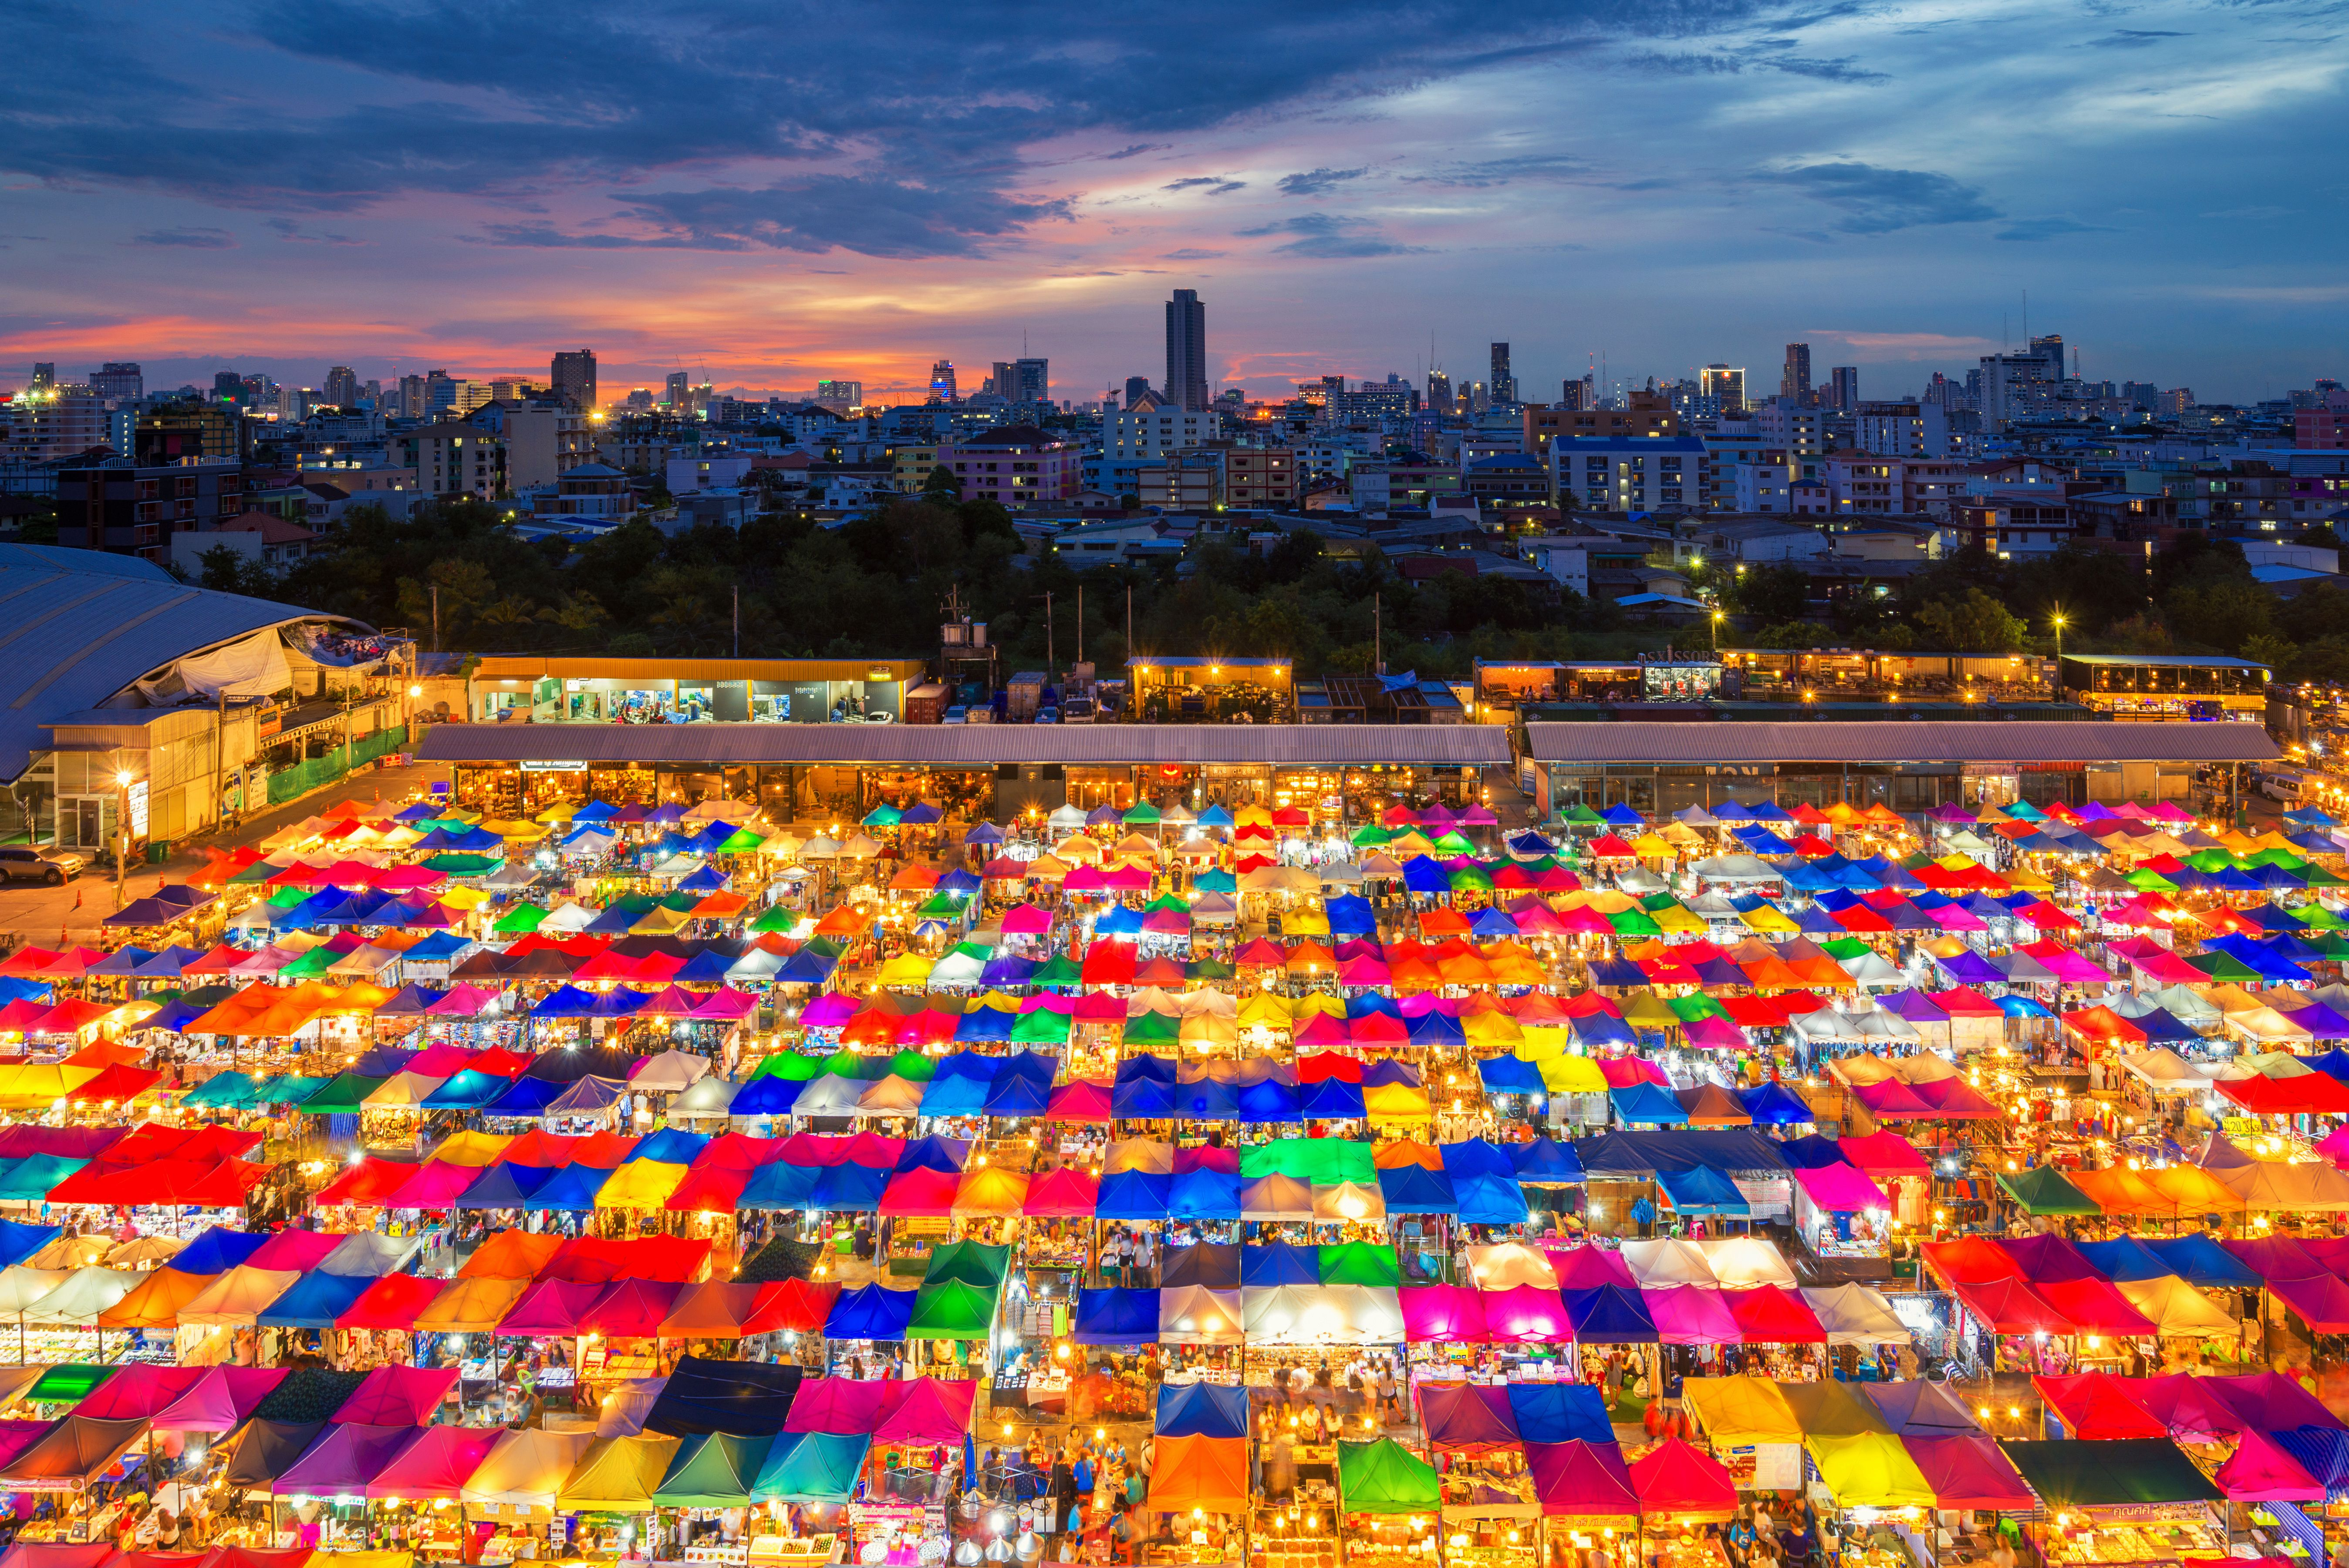 Chatuchak weekend market in bangkok shopping tips for Outdoor furniture thailand bangkok